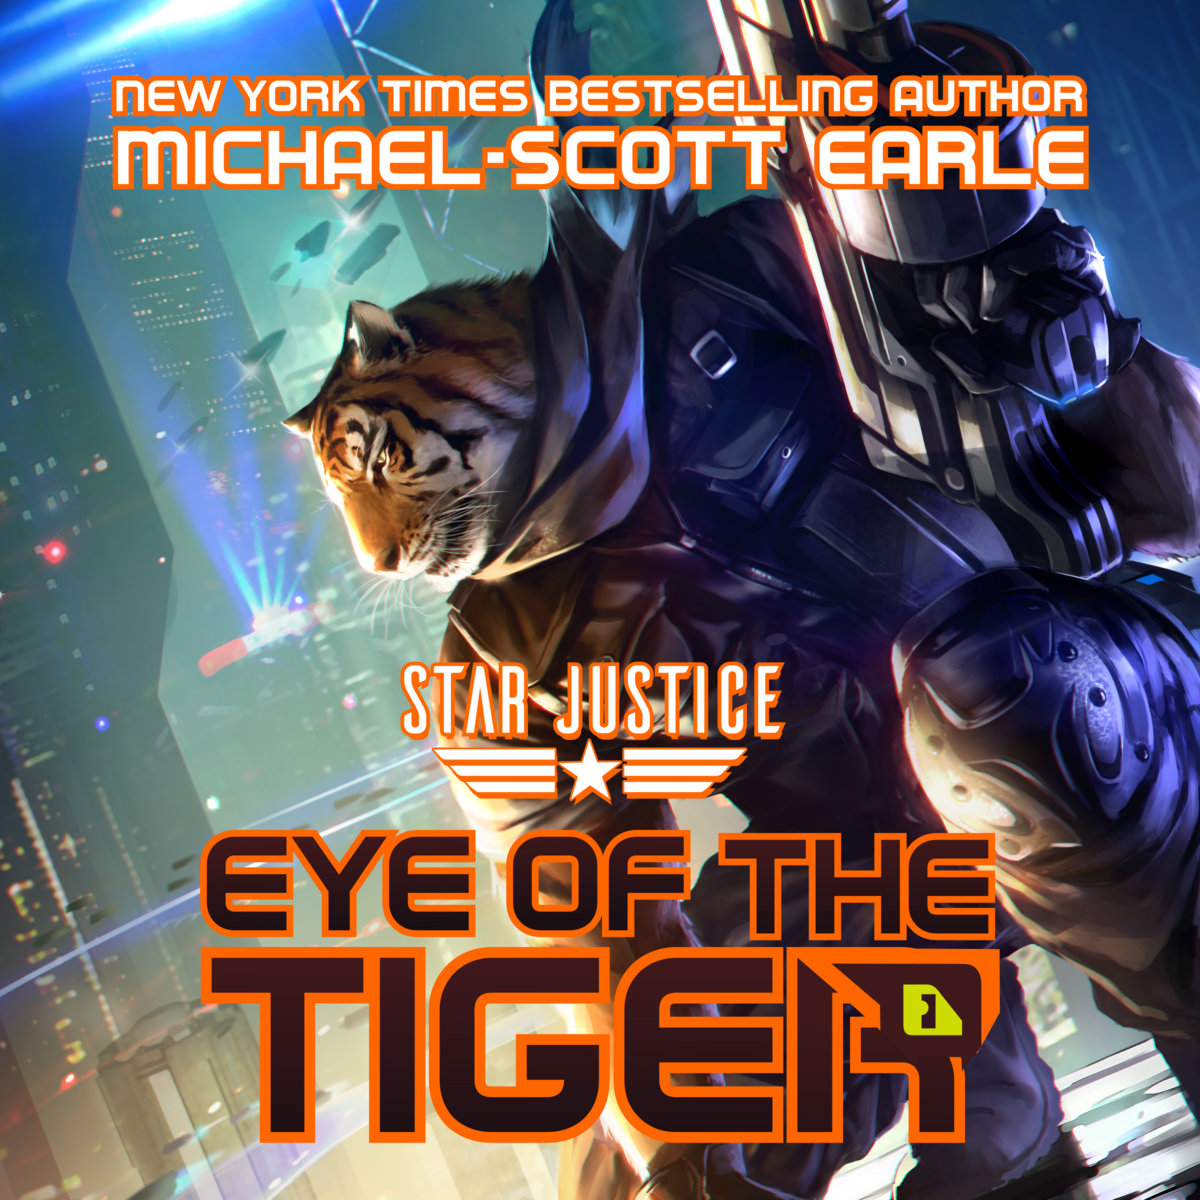 Eye of the Tiger - Michael-Scott Earle, Bandcamp